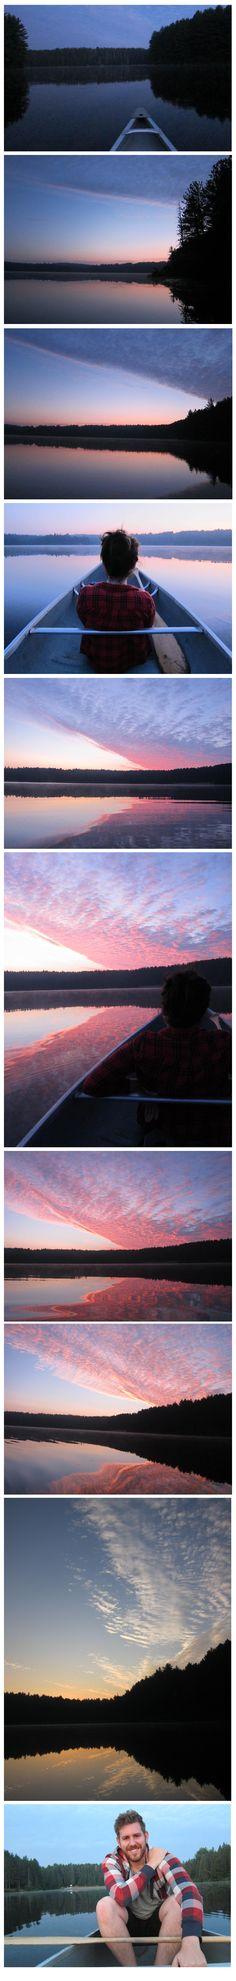 #83 - Watch a sunrise.  #100Thingsin2013